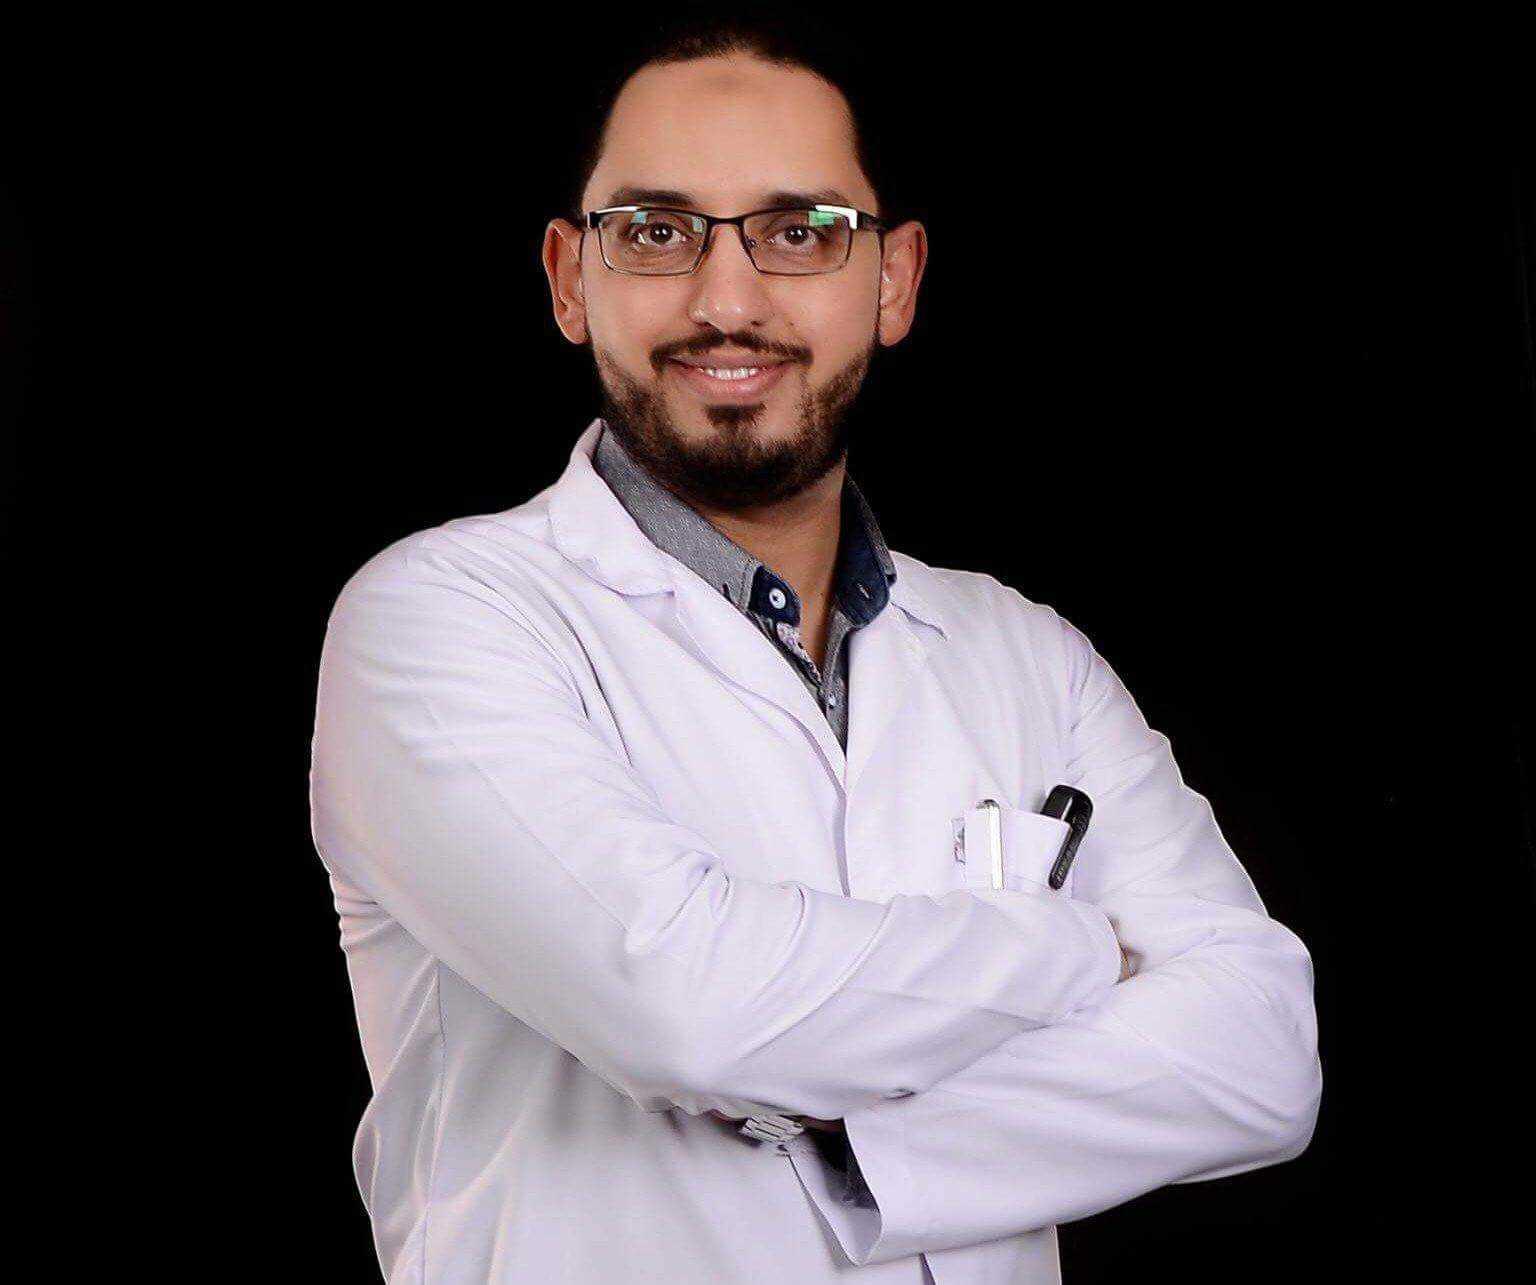 Doctor Ahmed Ali Zein El Abdein Gynecologist